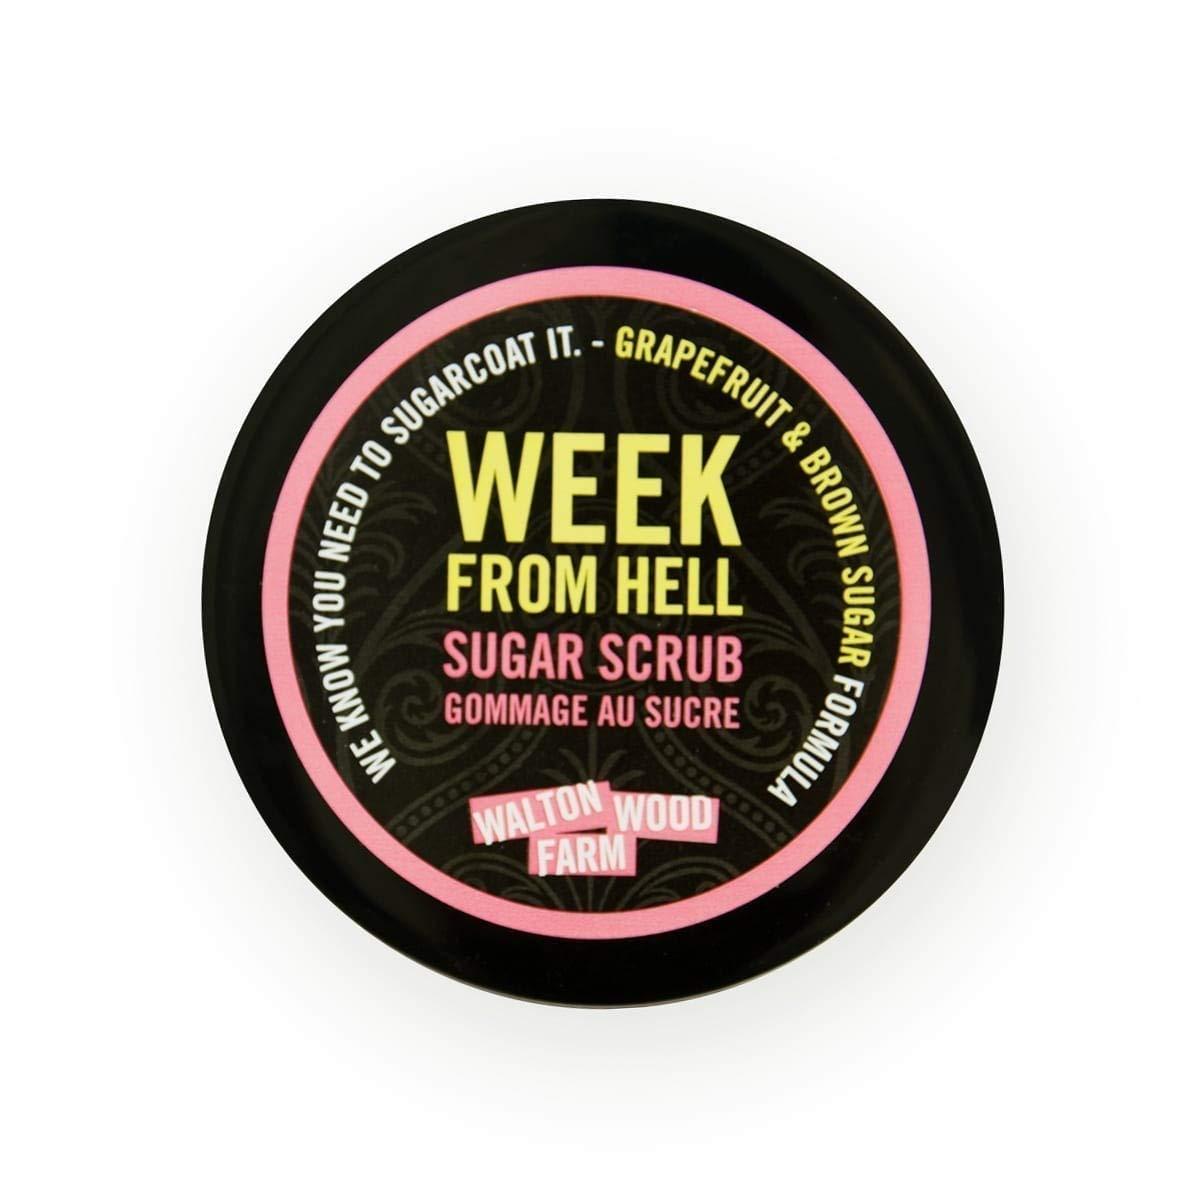 Walton Wood Farm Sugar Scrub (Week From Hell) Grapefruit and Brown Sugar Scent Vegan-Friendly and Paraben-Free 8 oz